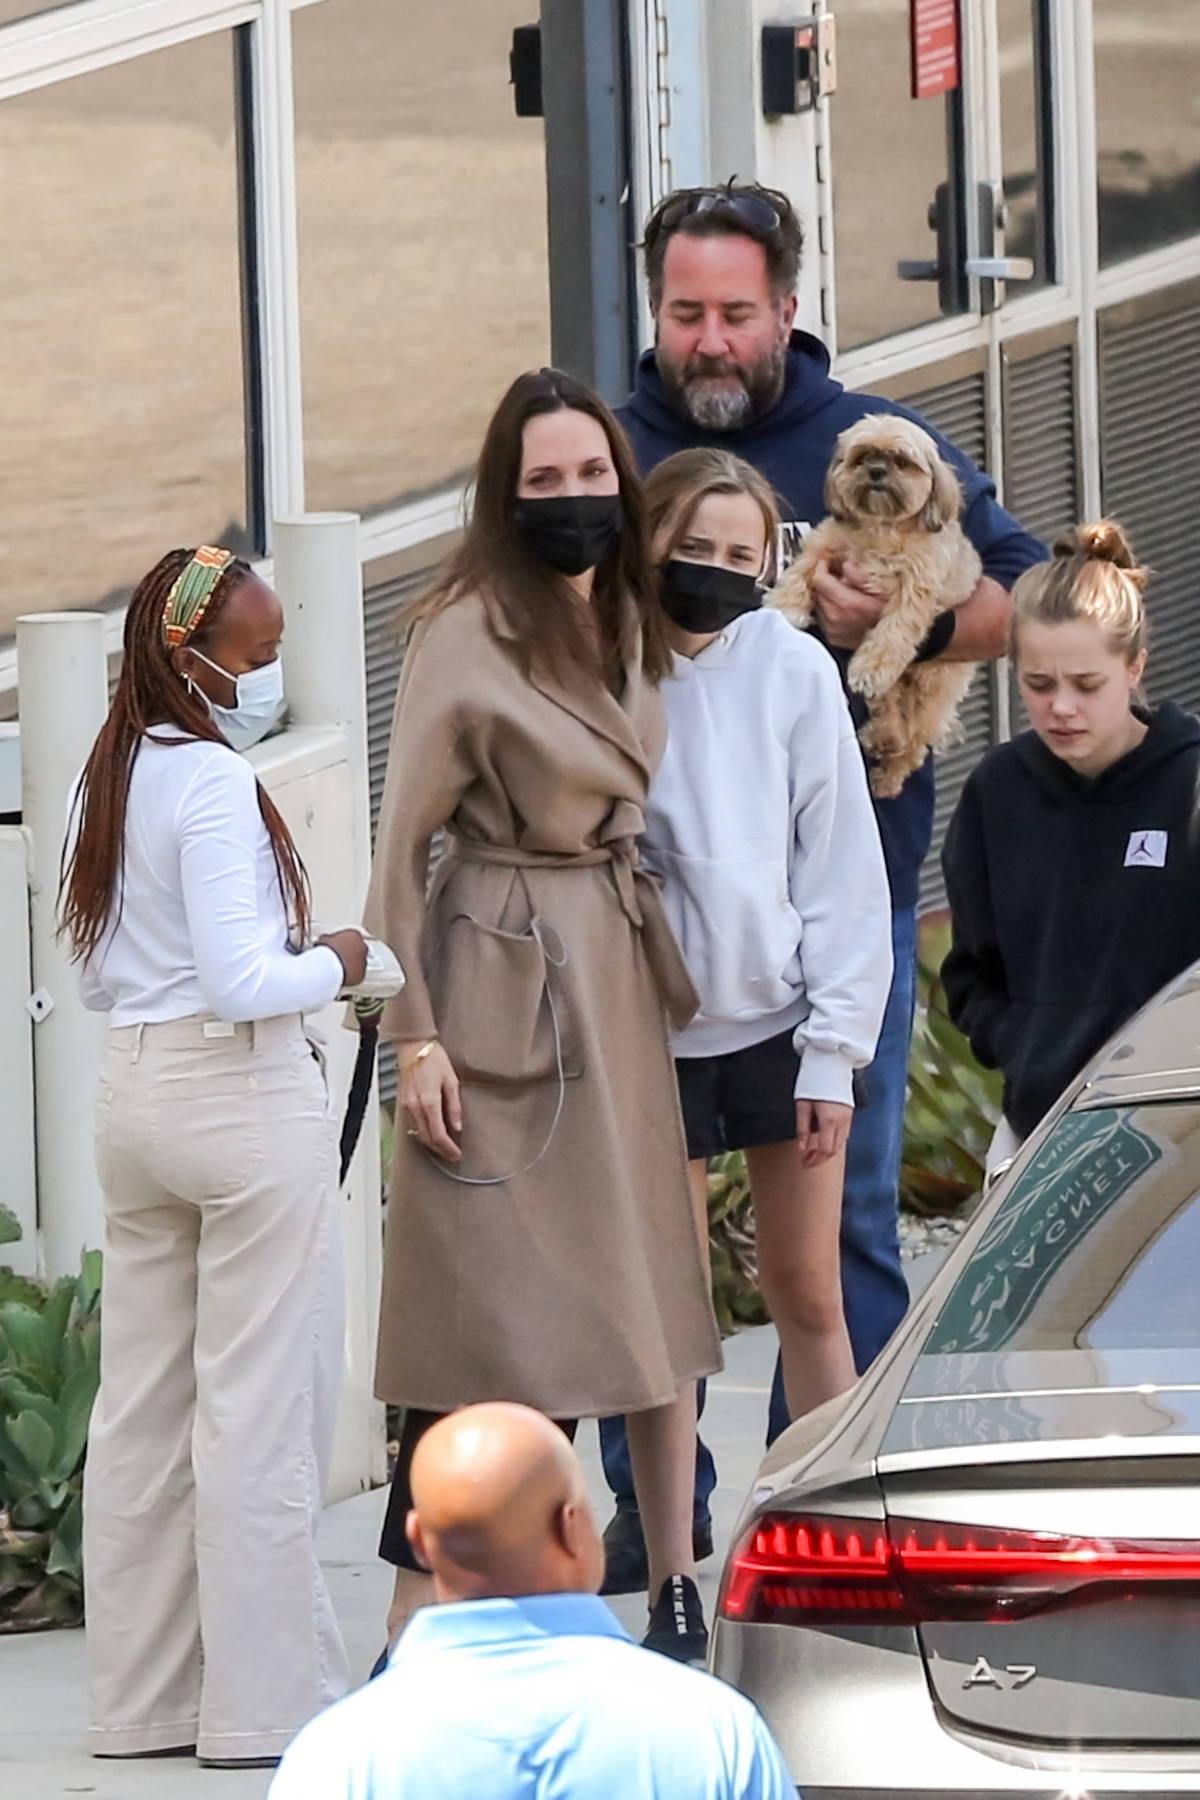 Angelina Jolie seen hugging her kids as she leaves an hospital in Burbank, California